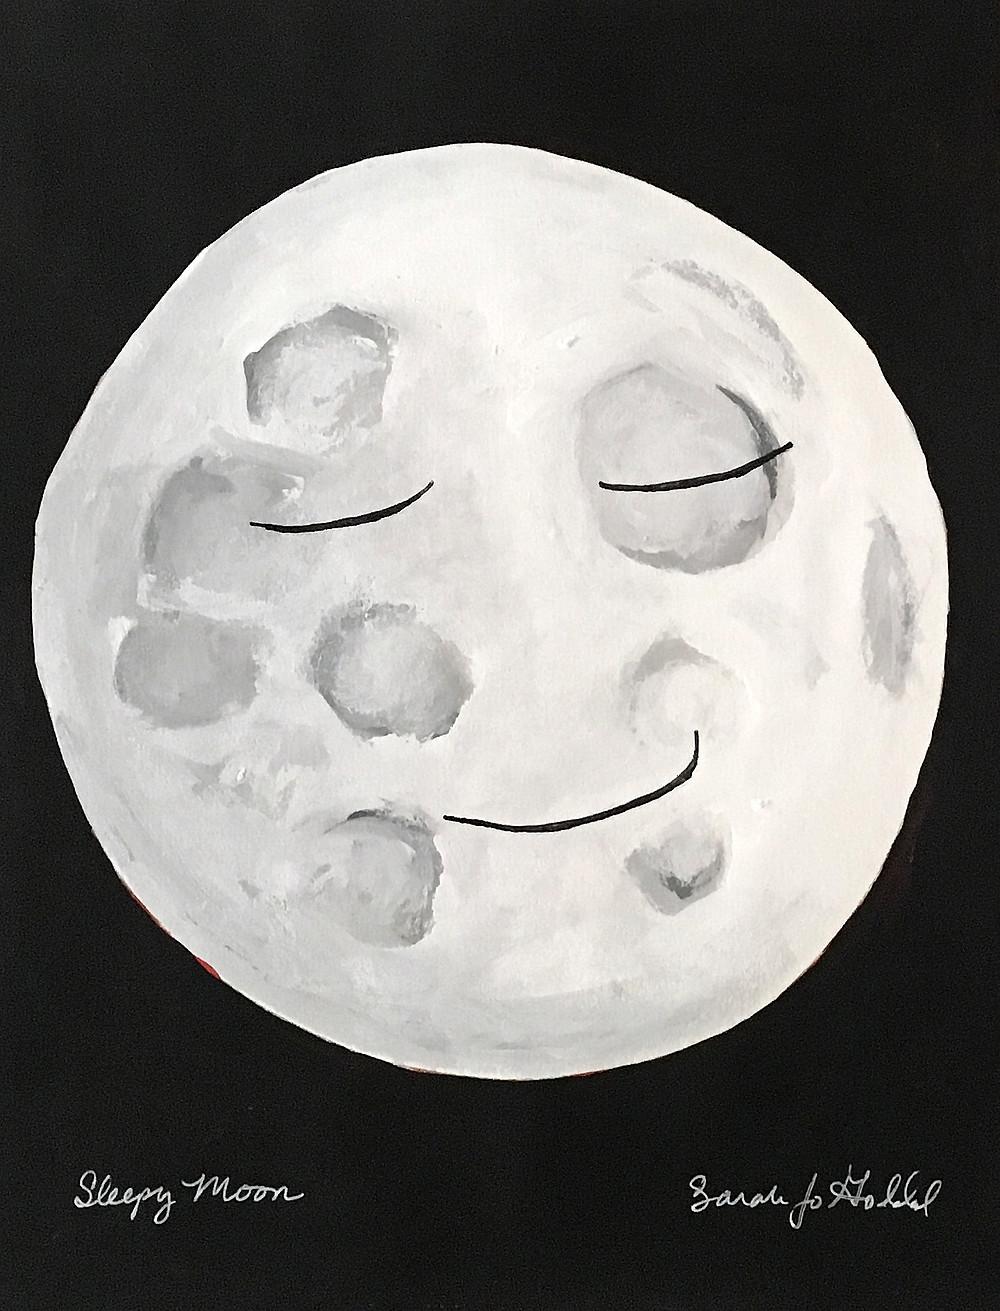 Sleepy Moon Black Background